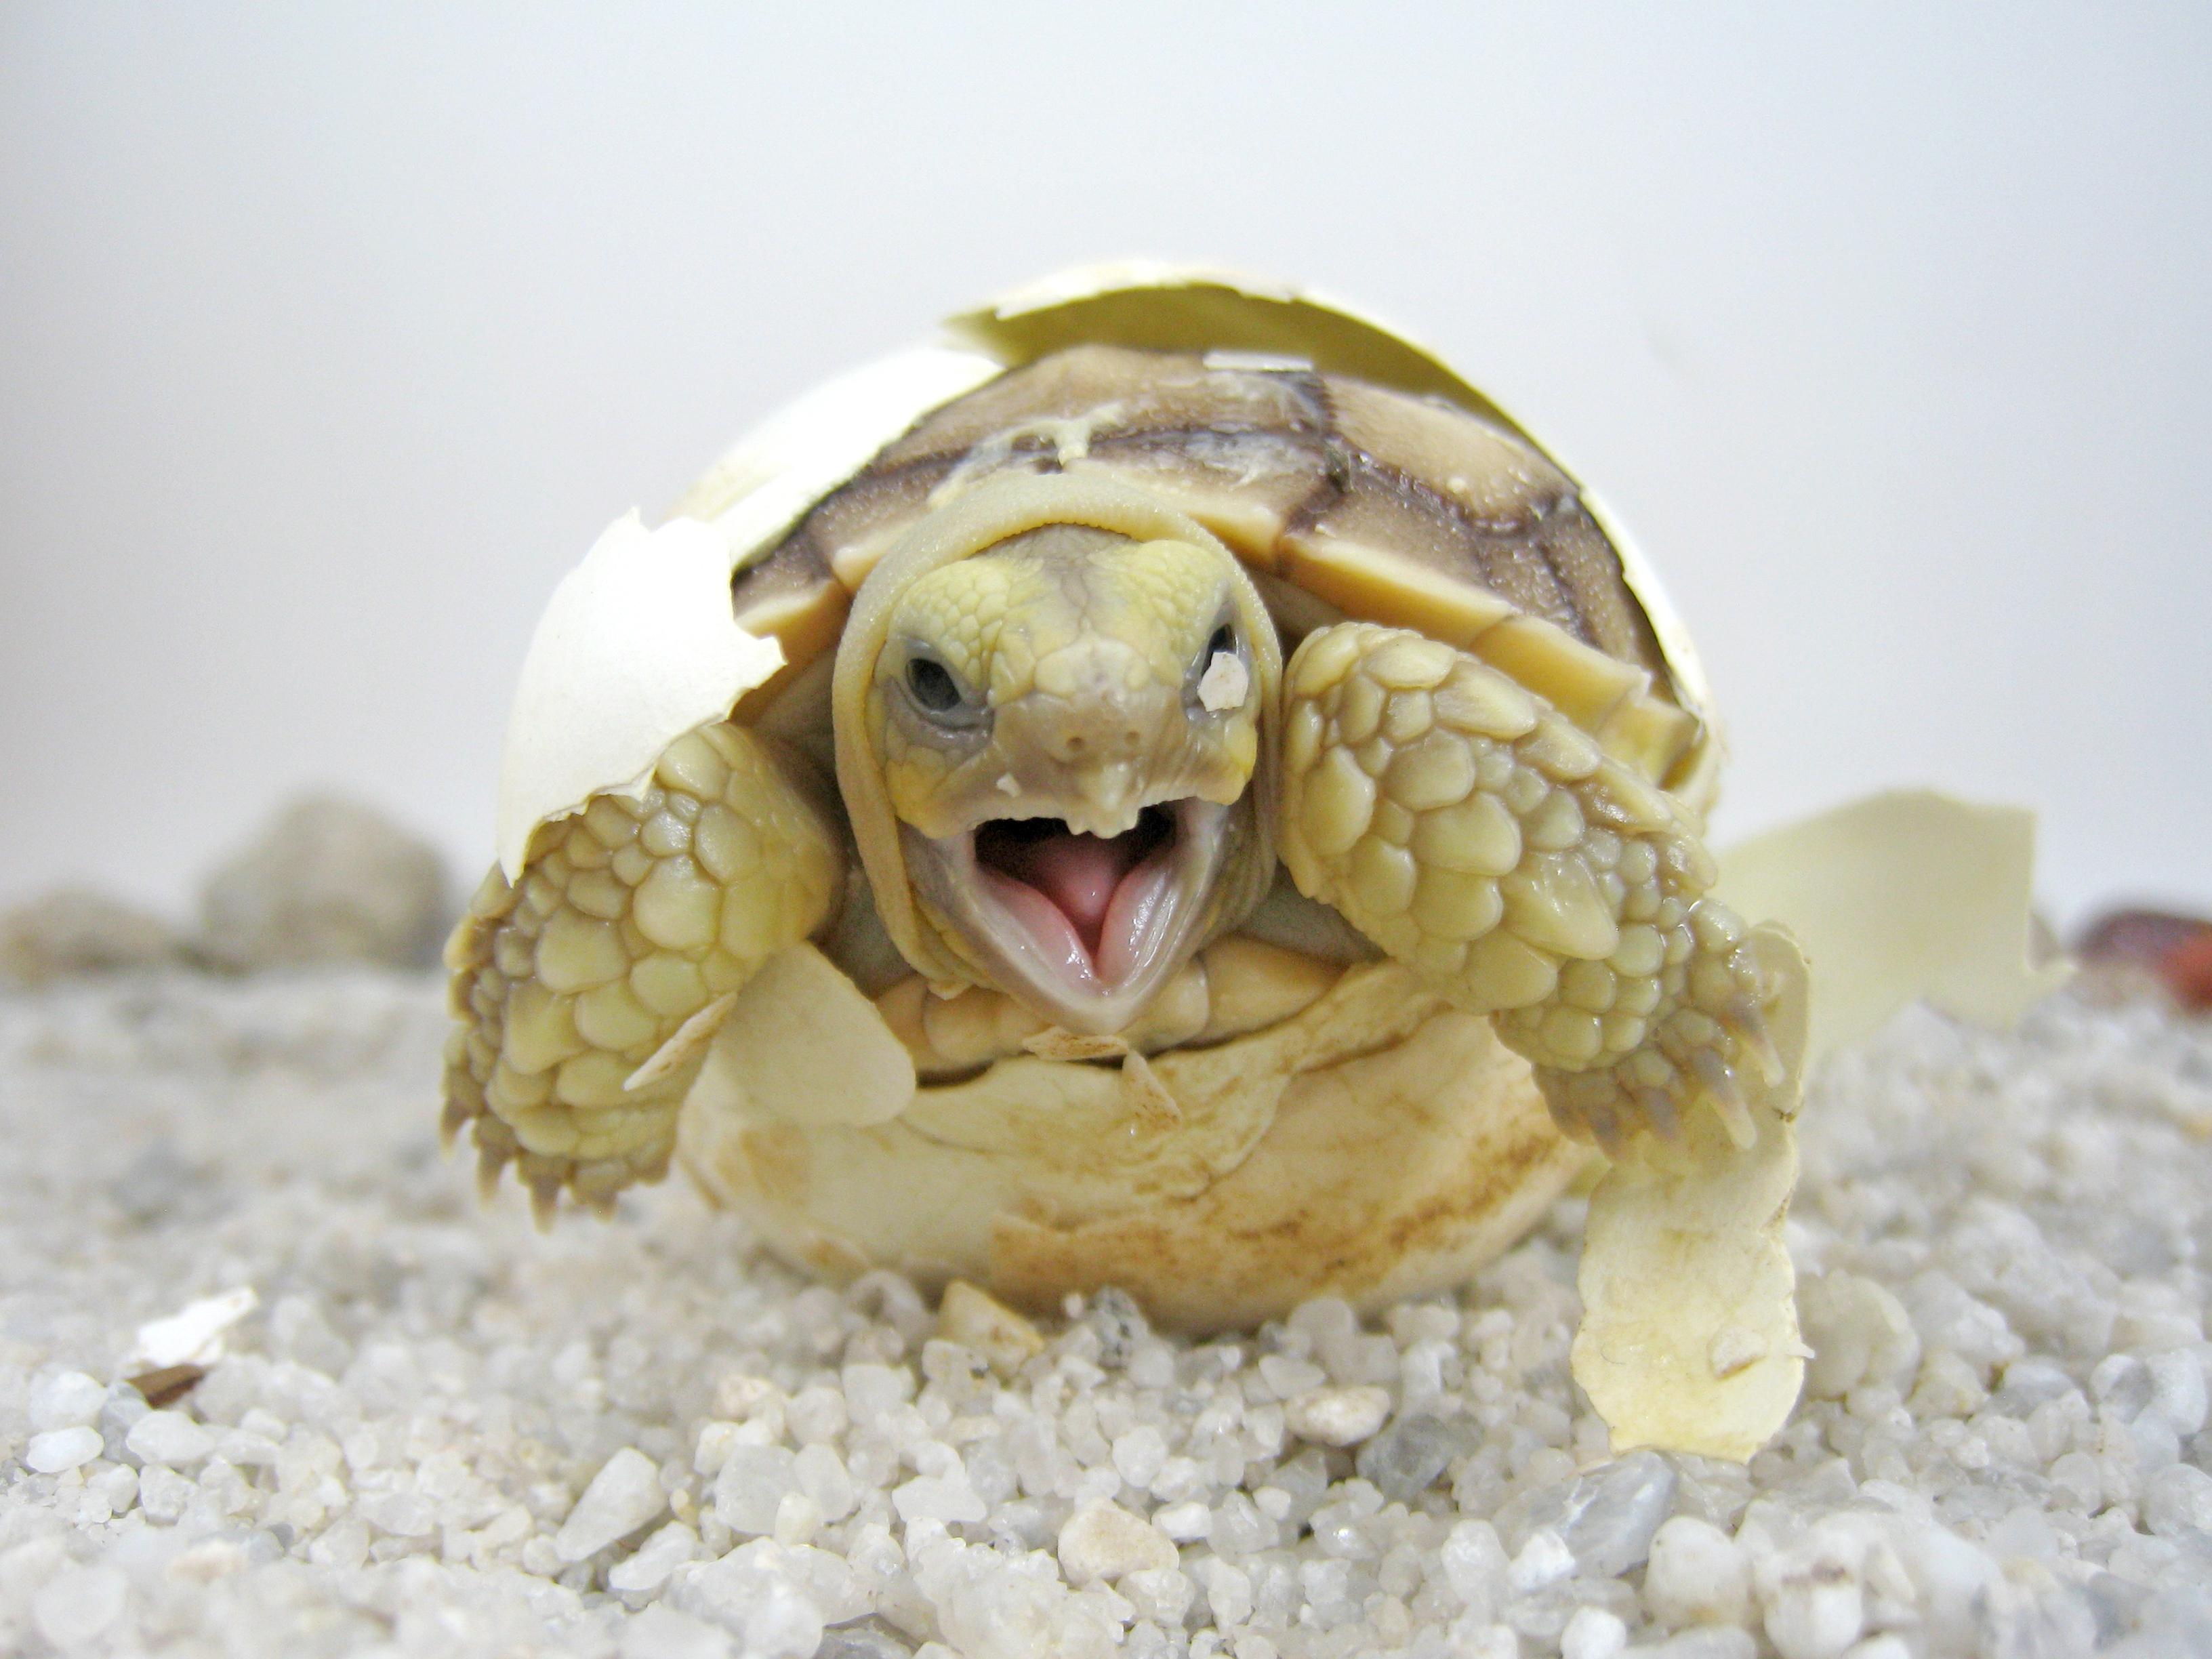 Baby tortoise hatching-72ppt